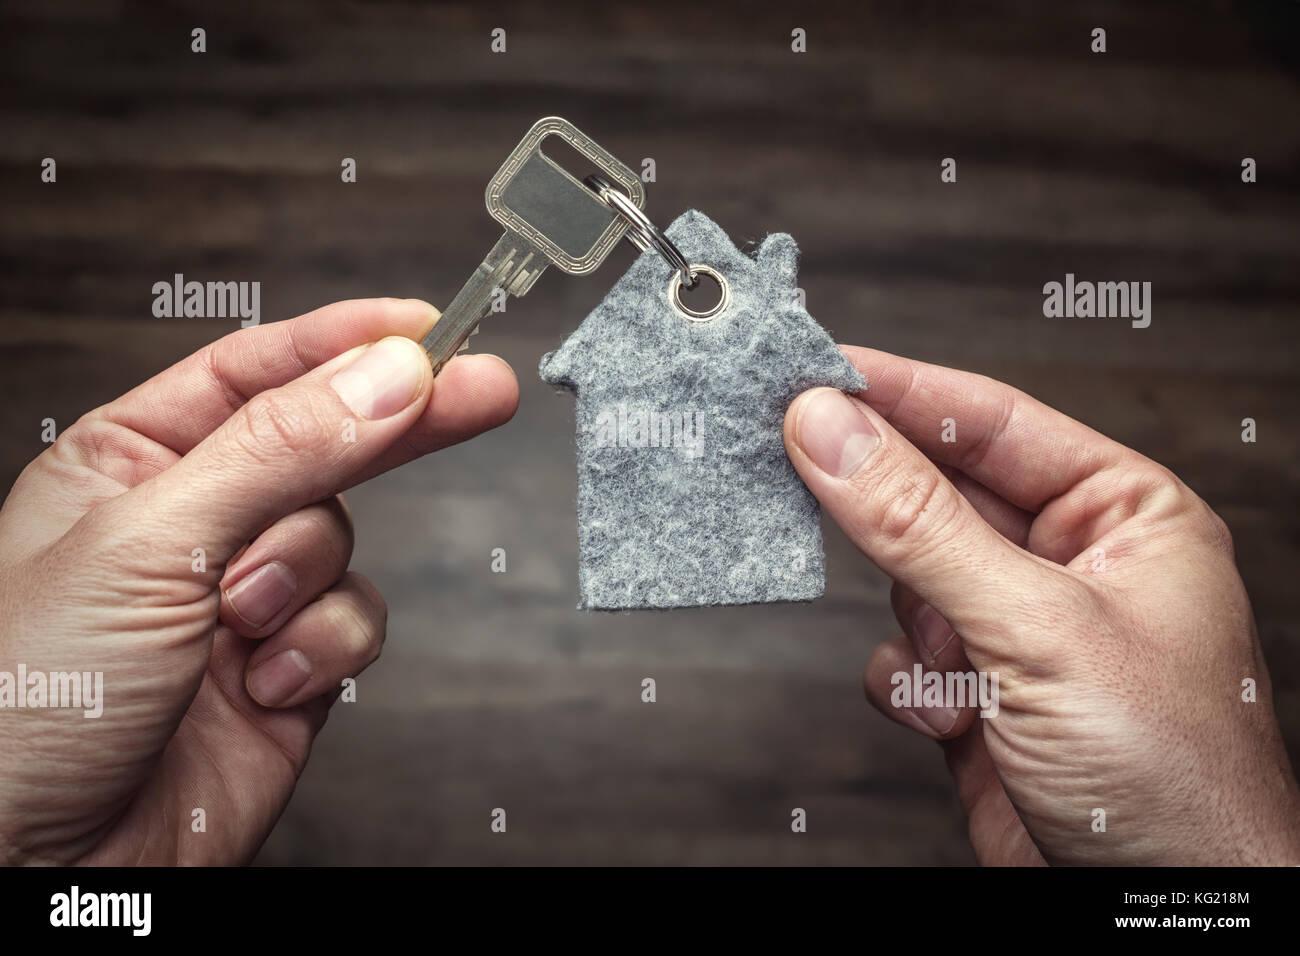 Latchkey in between two hands - Stock Image